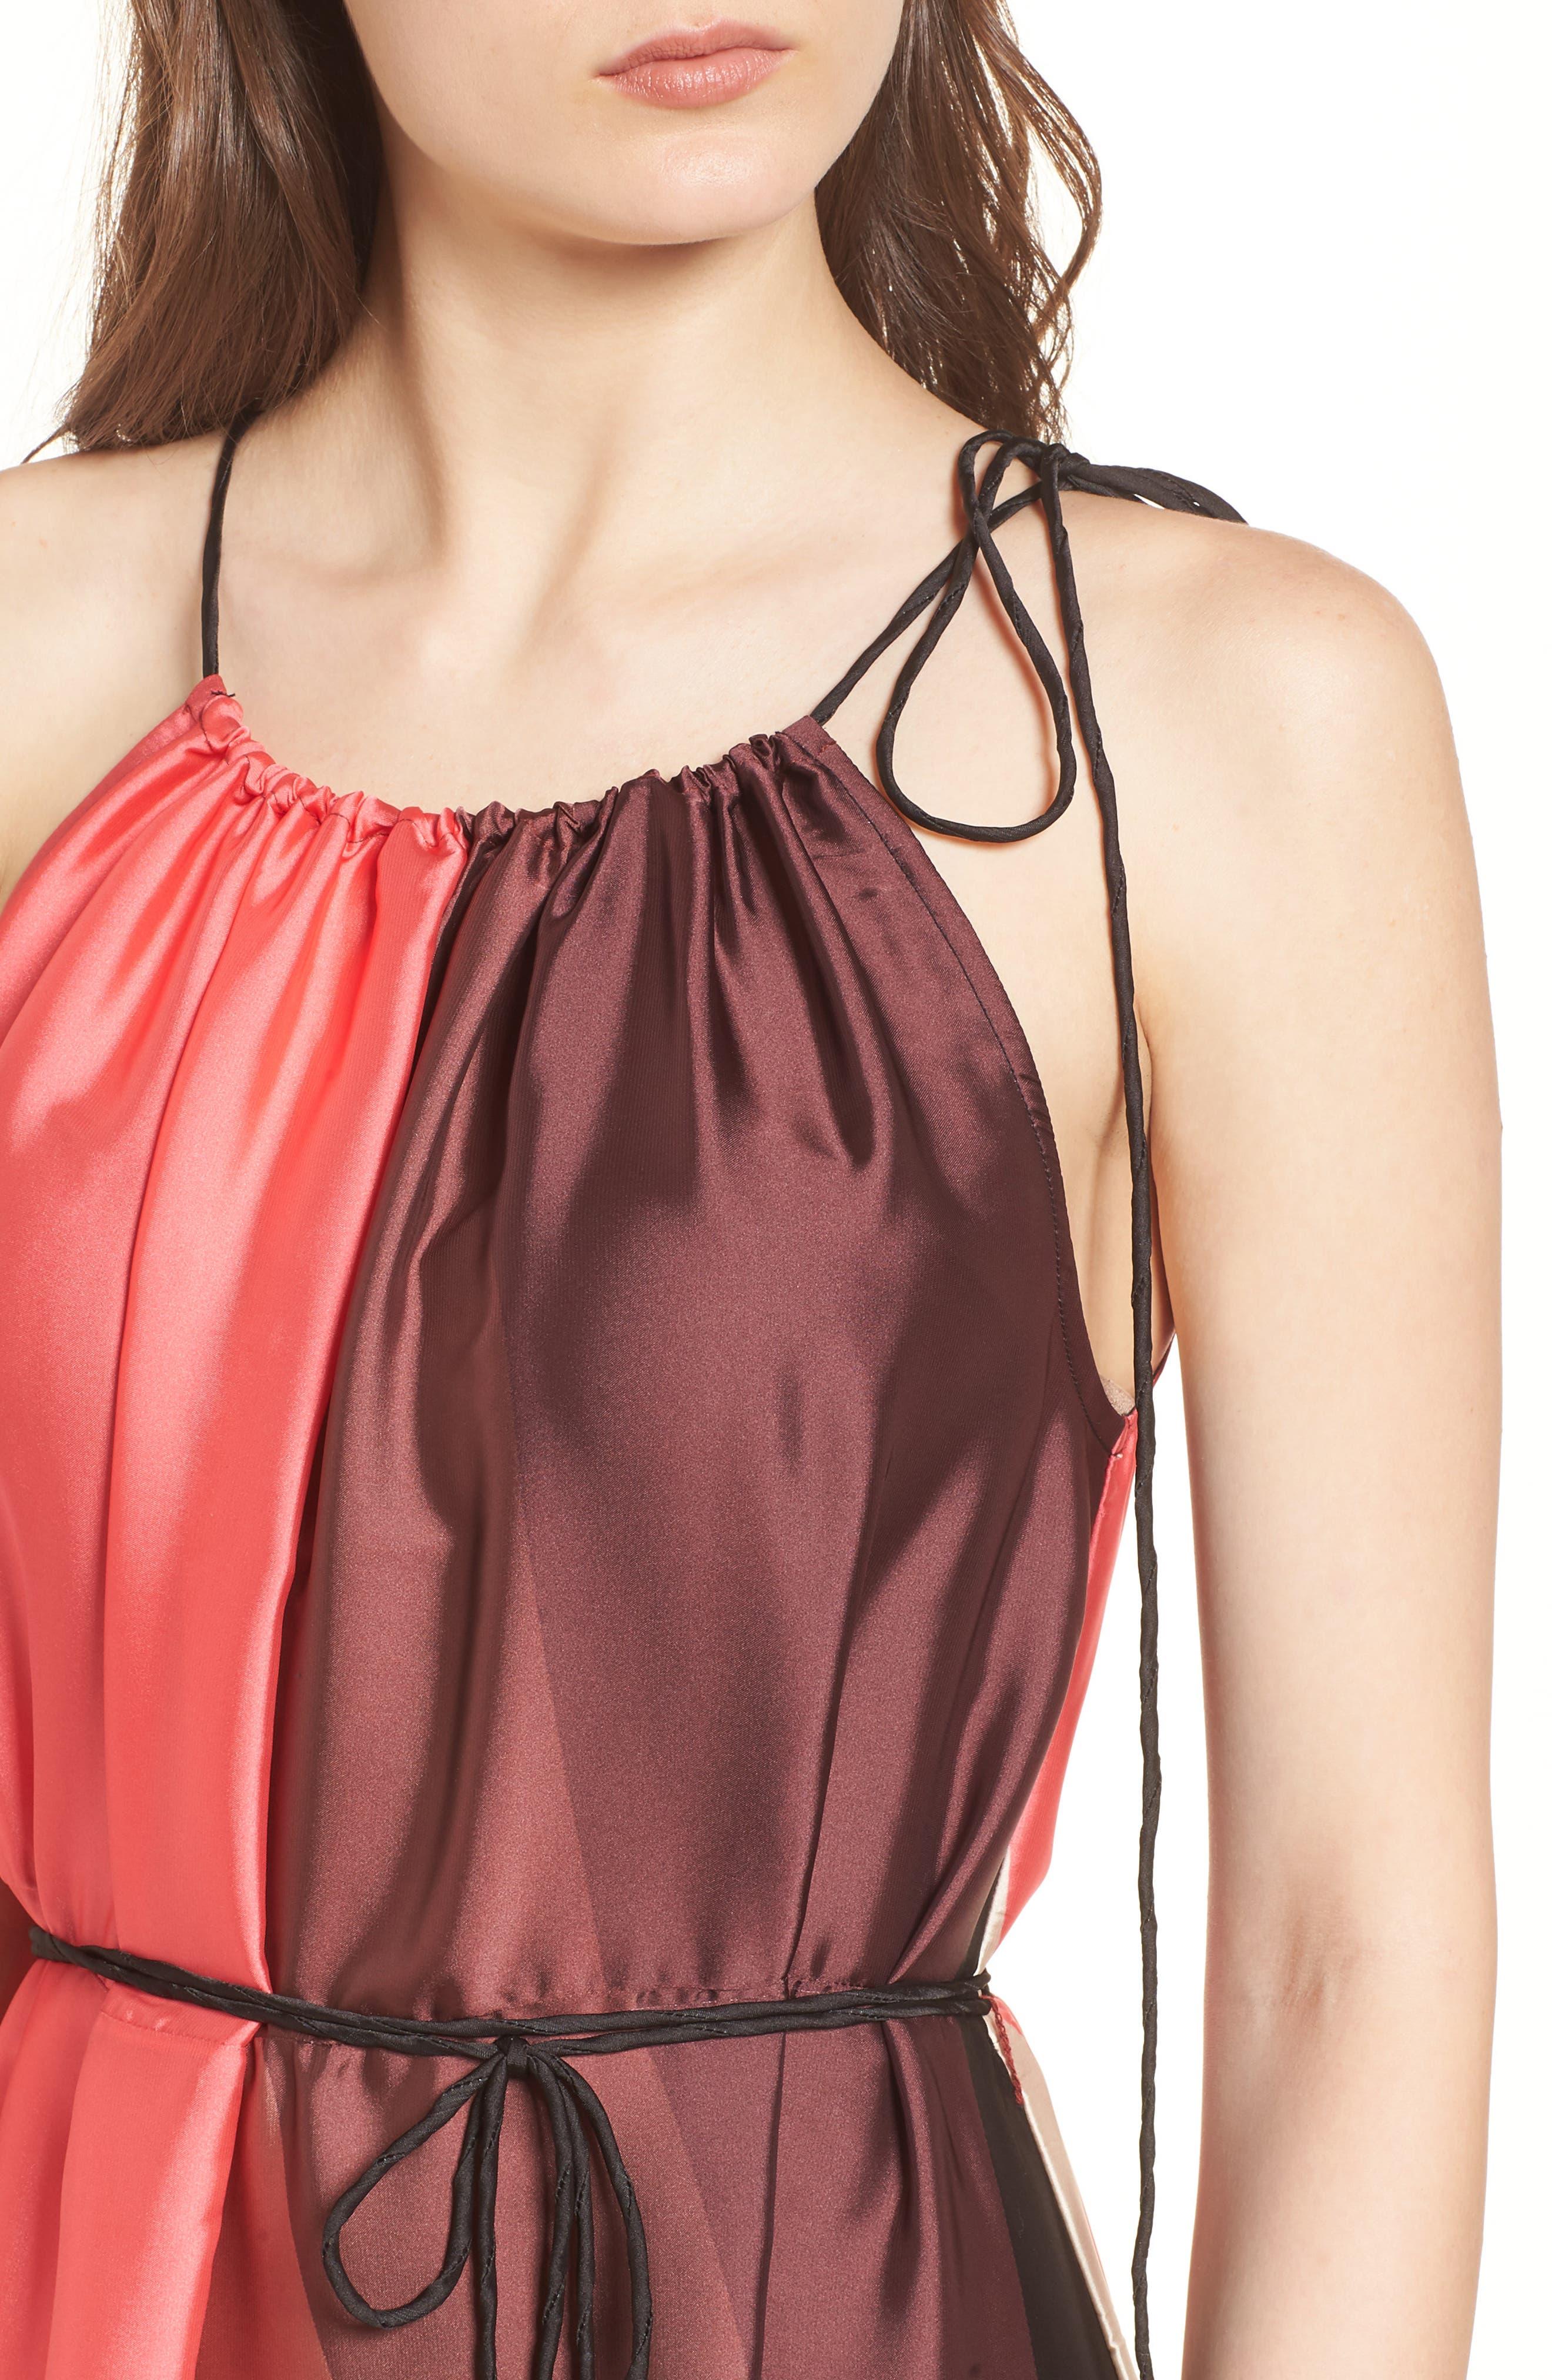 Icy Shores Maxi Dress,                             Alternate thumbnail 4, color,                             903